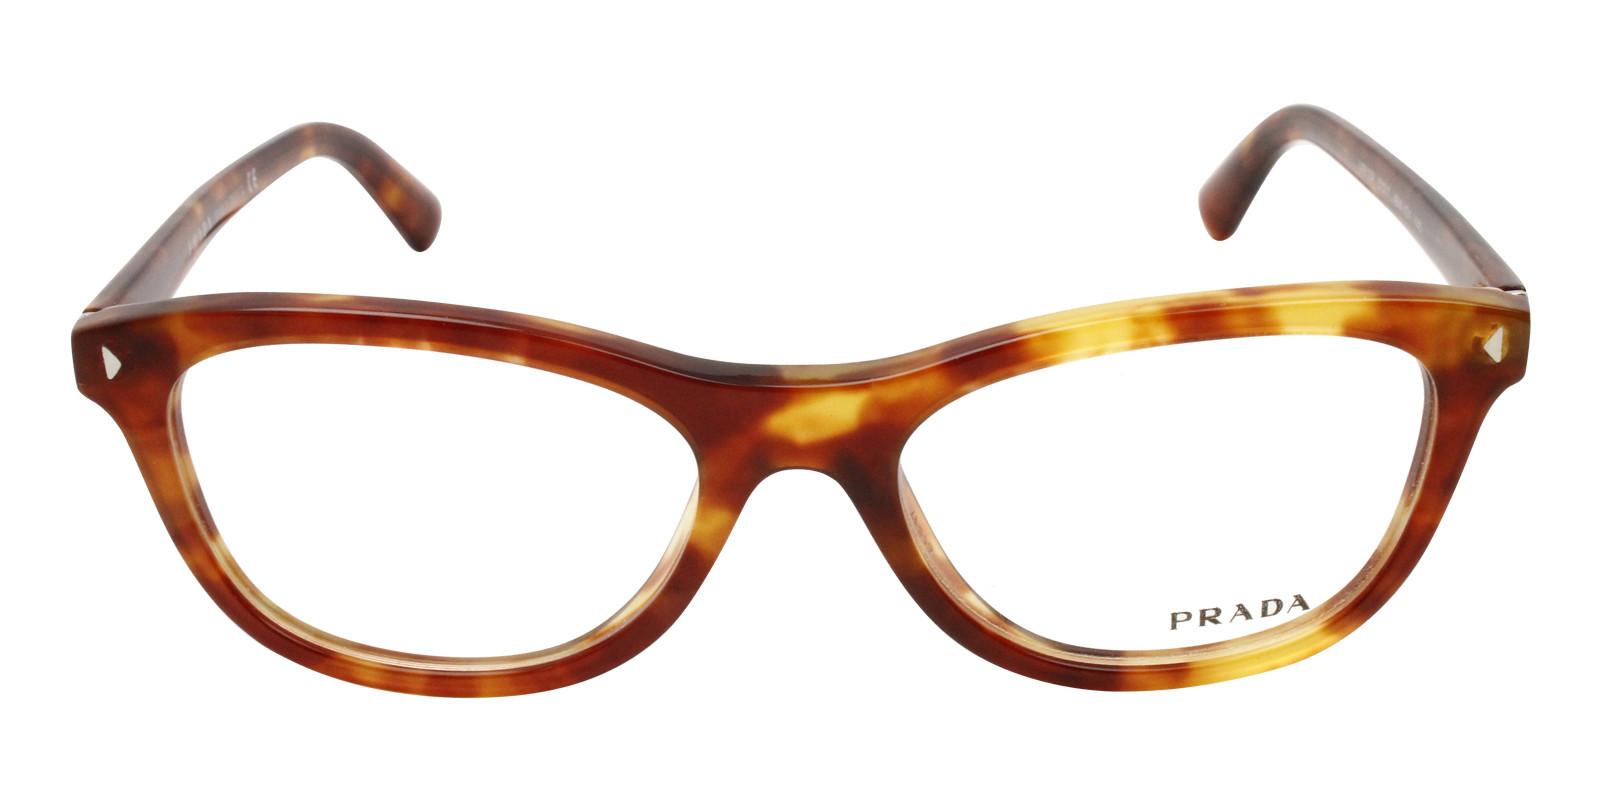 Eyeglasses Frame Prada : New PRADA VPR05R PR05RV 4BW-1O1 Authentic Eyeglasses Frame